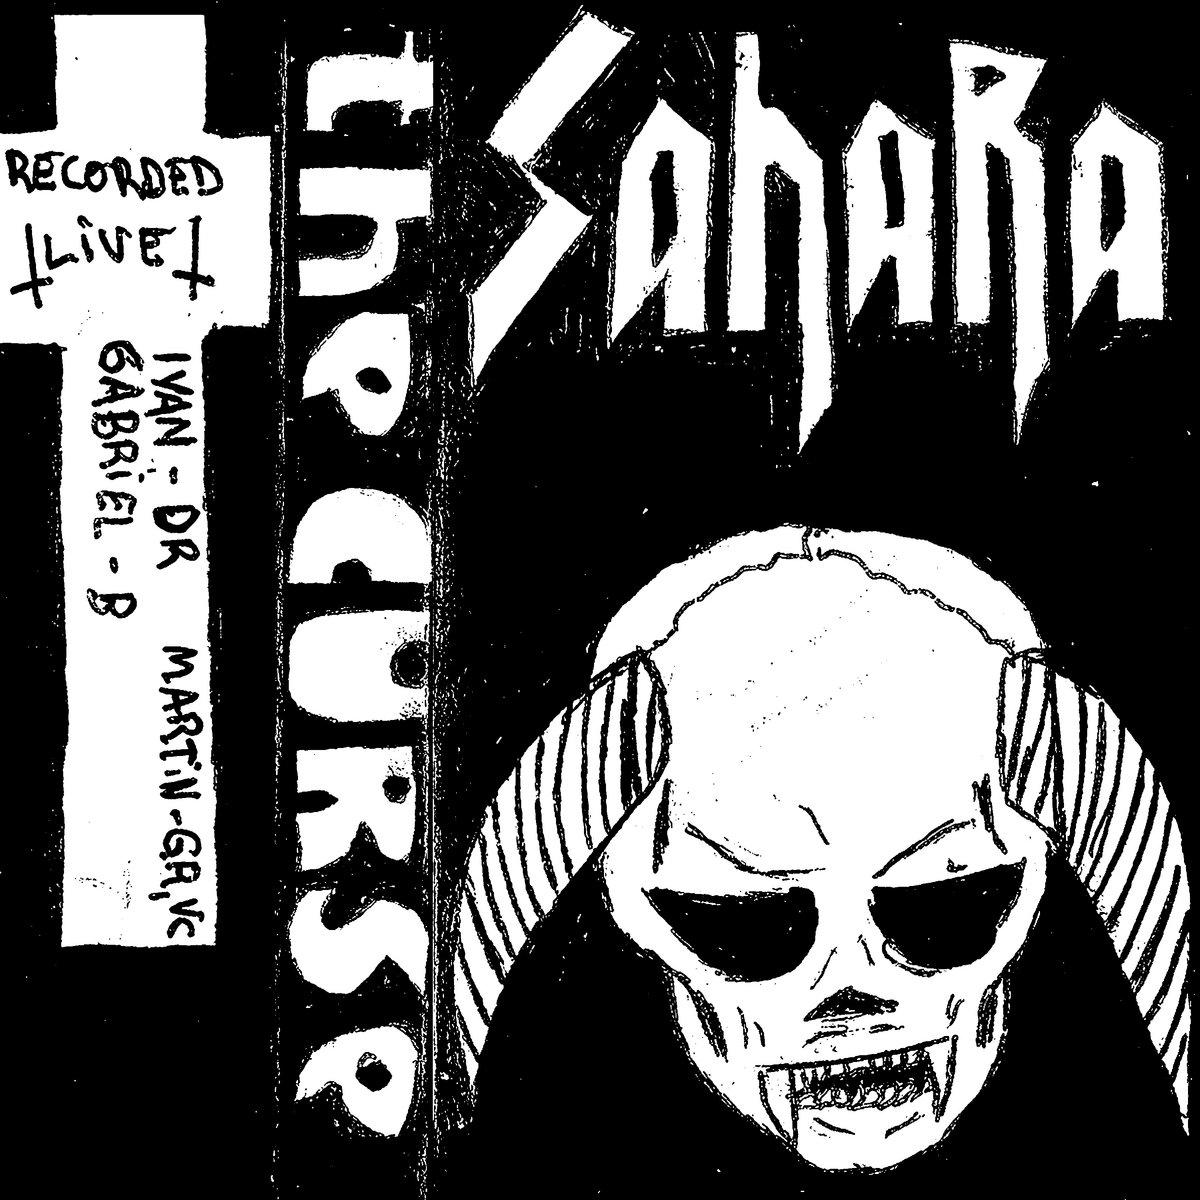 sahara the curse